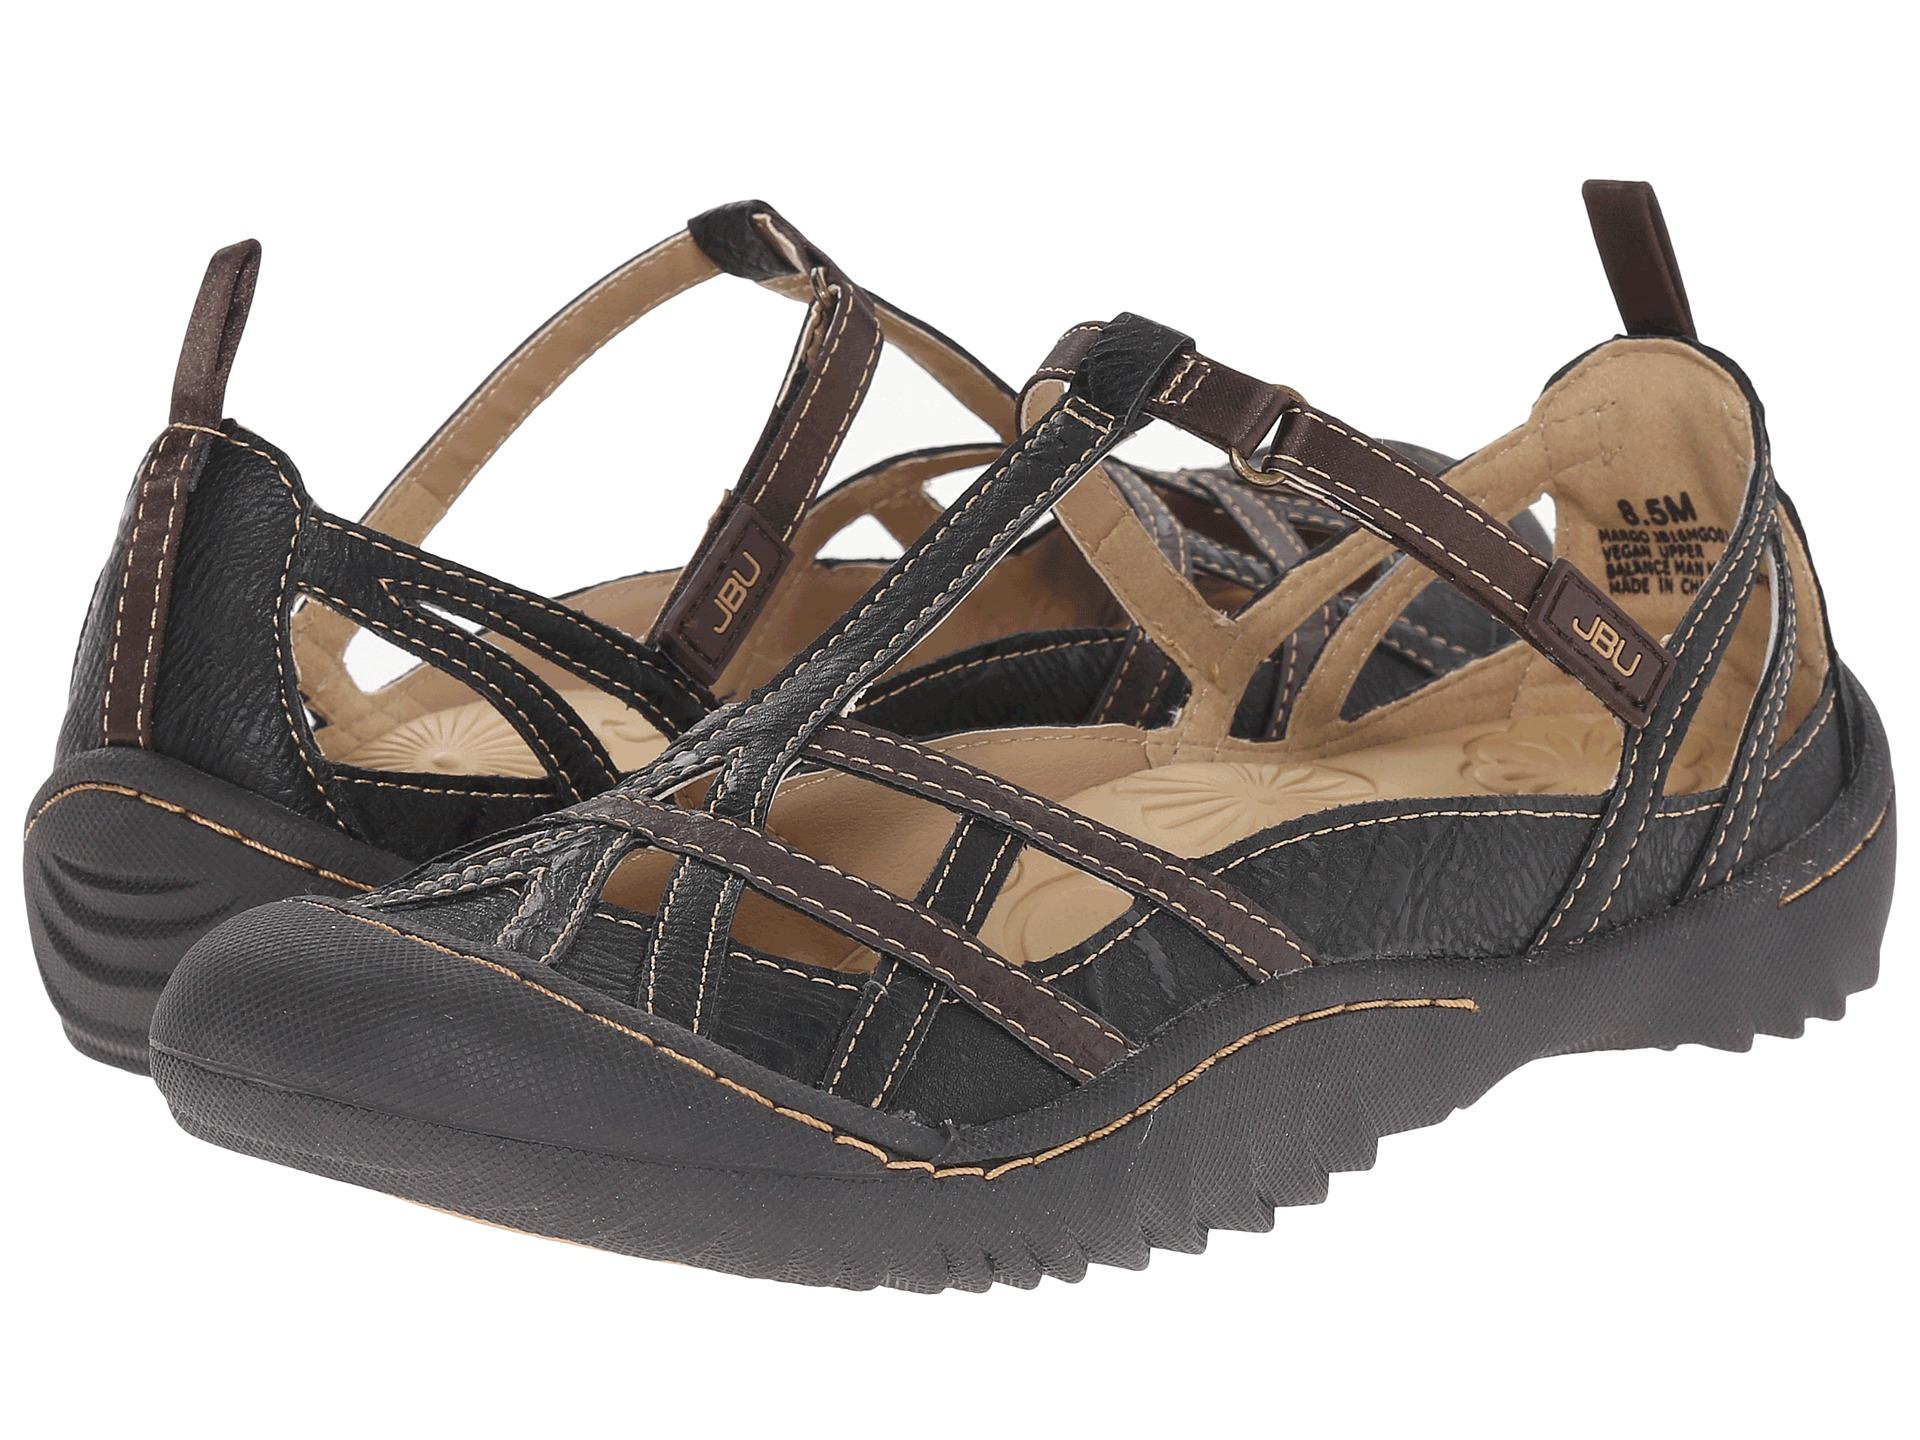 Jbu Brand Shoes Review